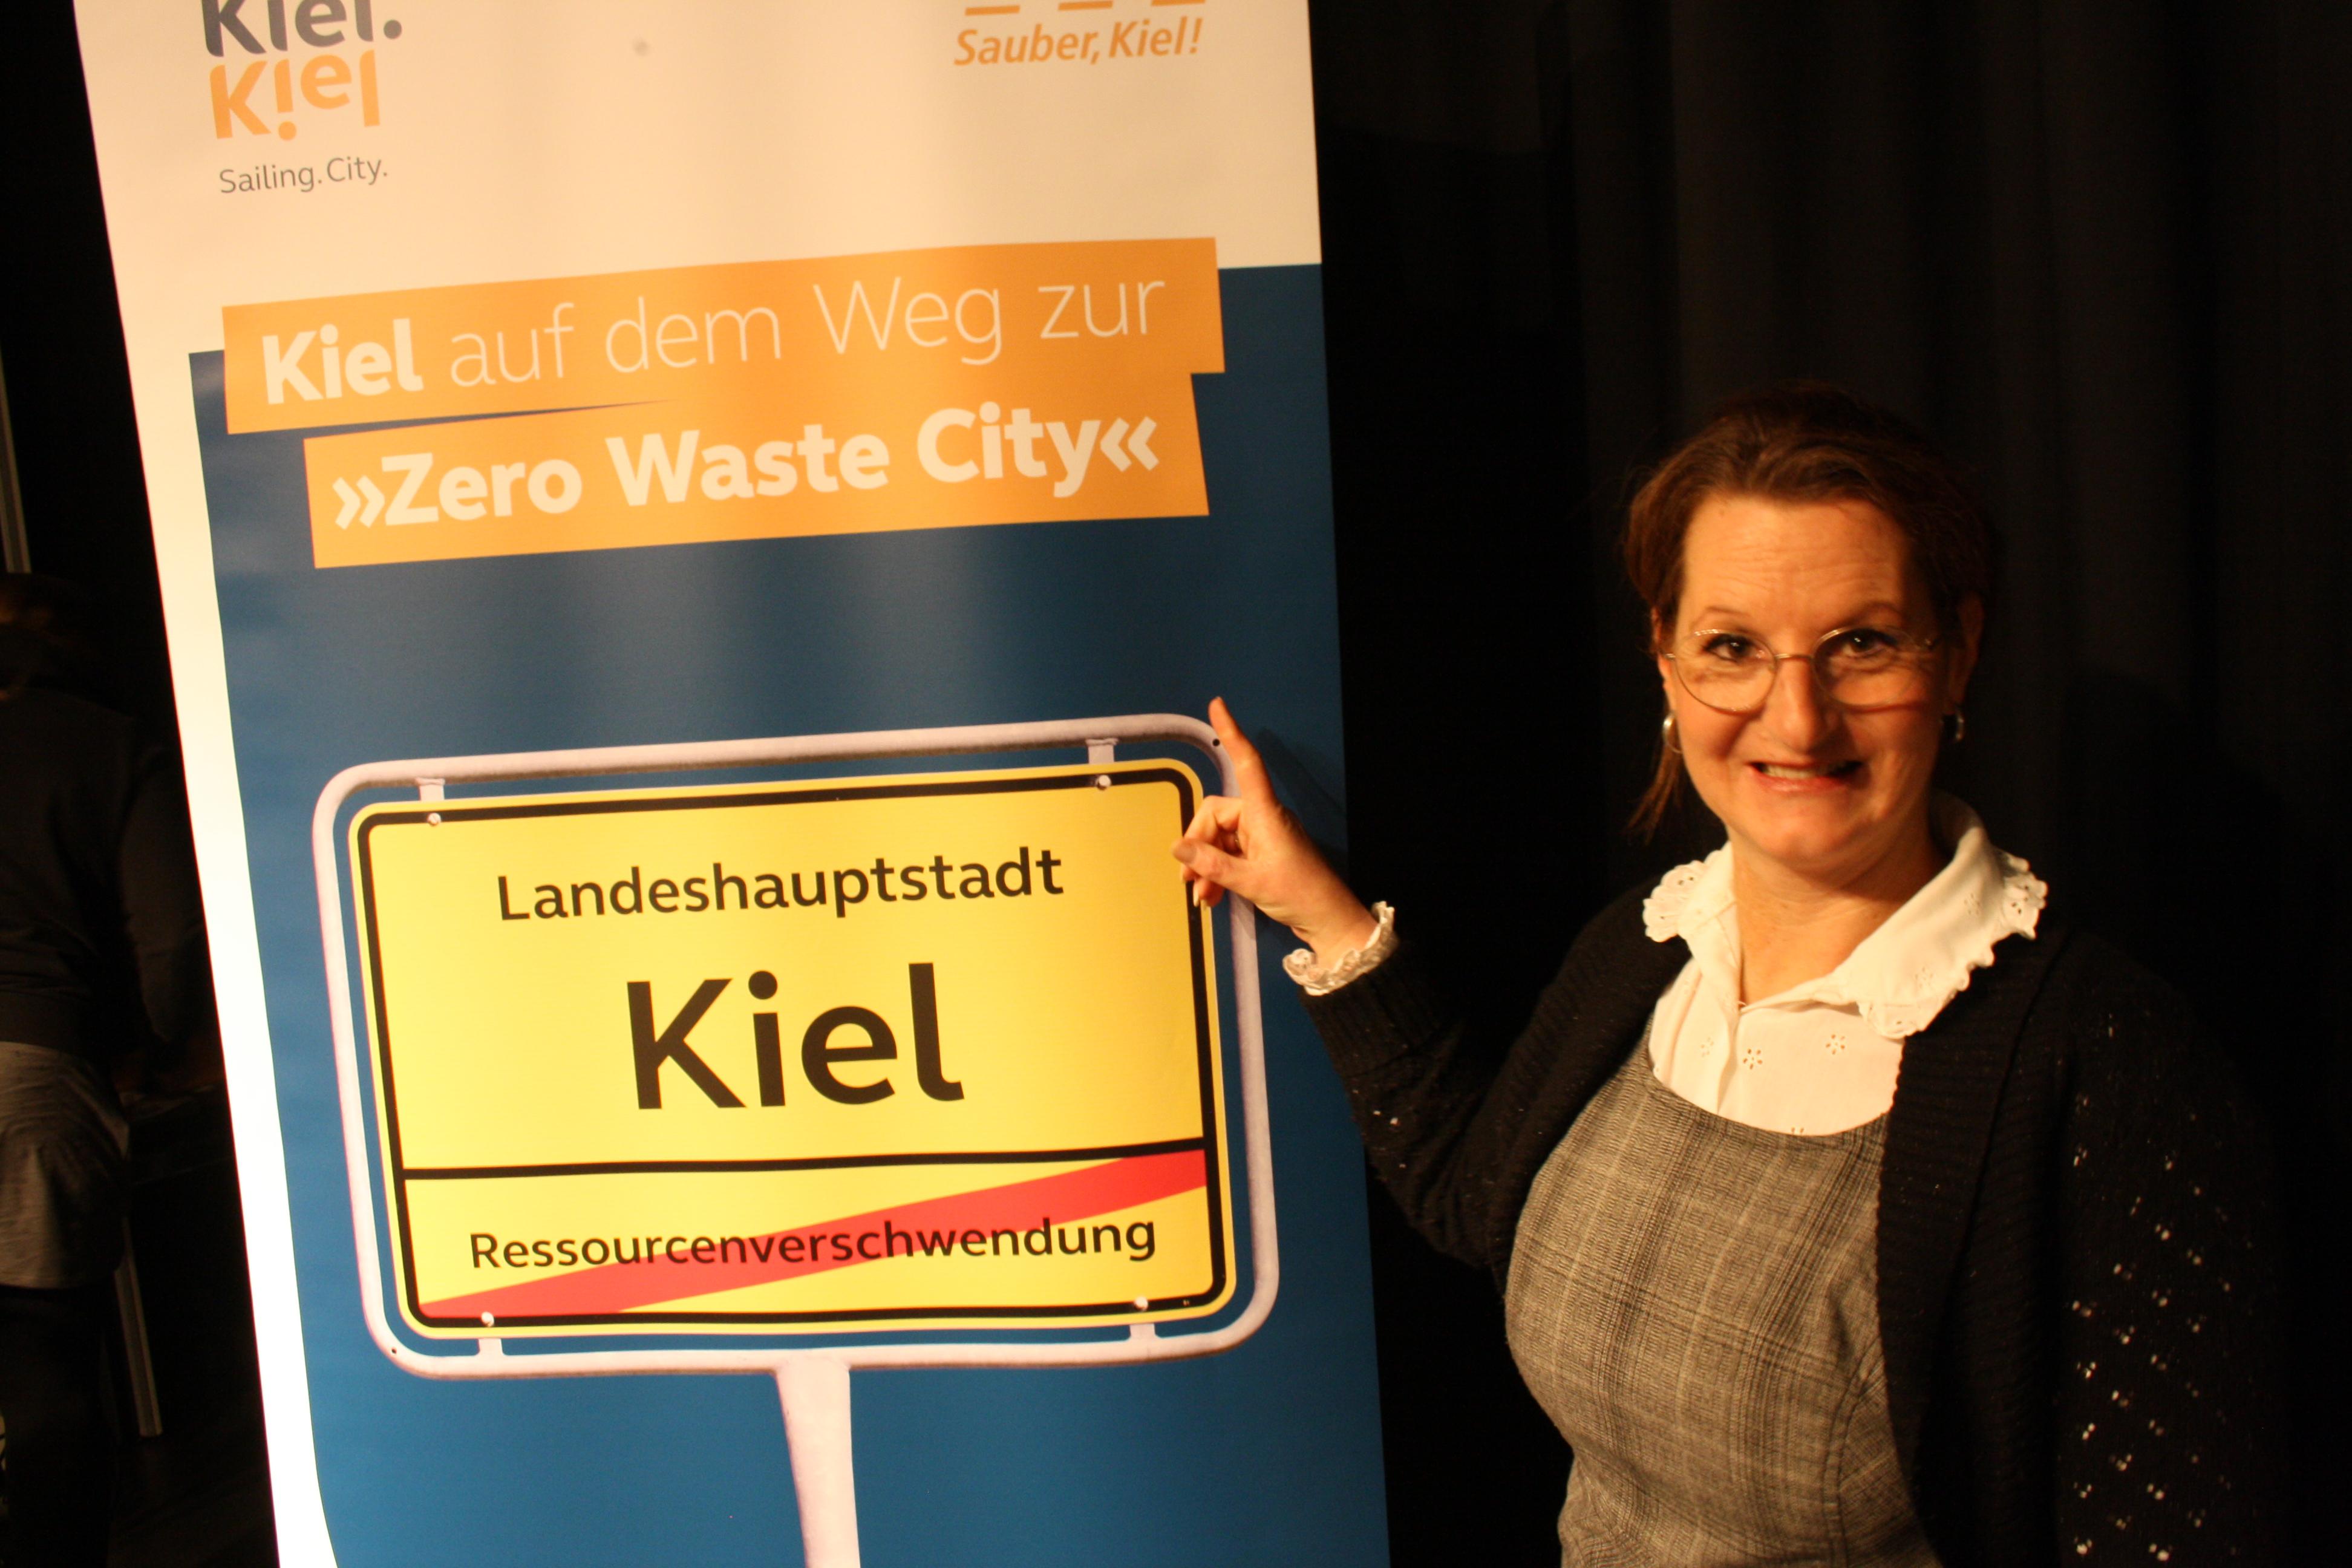 Puff aus Kiel (SH, Landeshauptstadt)